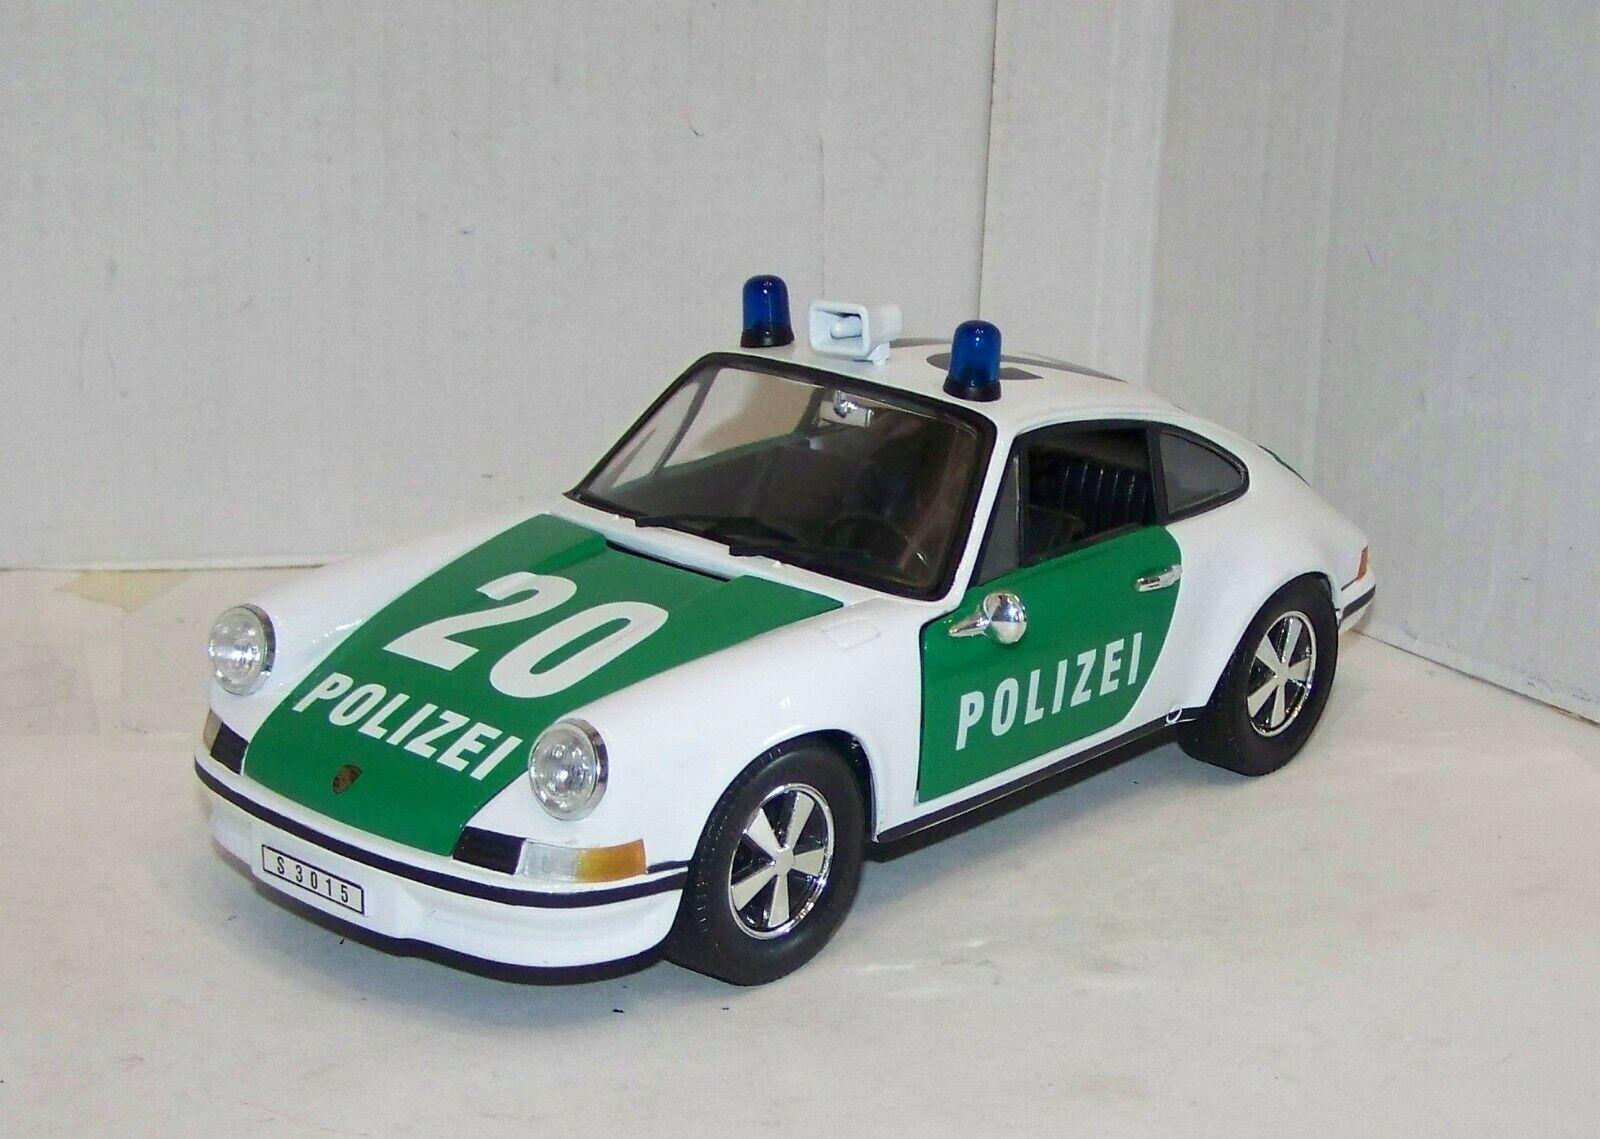 Universal Hobbies 1 18, Porsche 911 Polizei, lesen, XR9005X